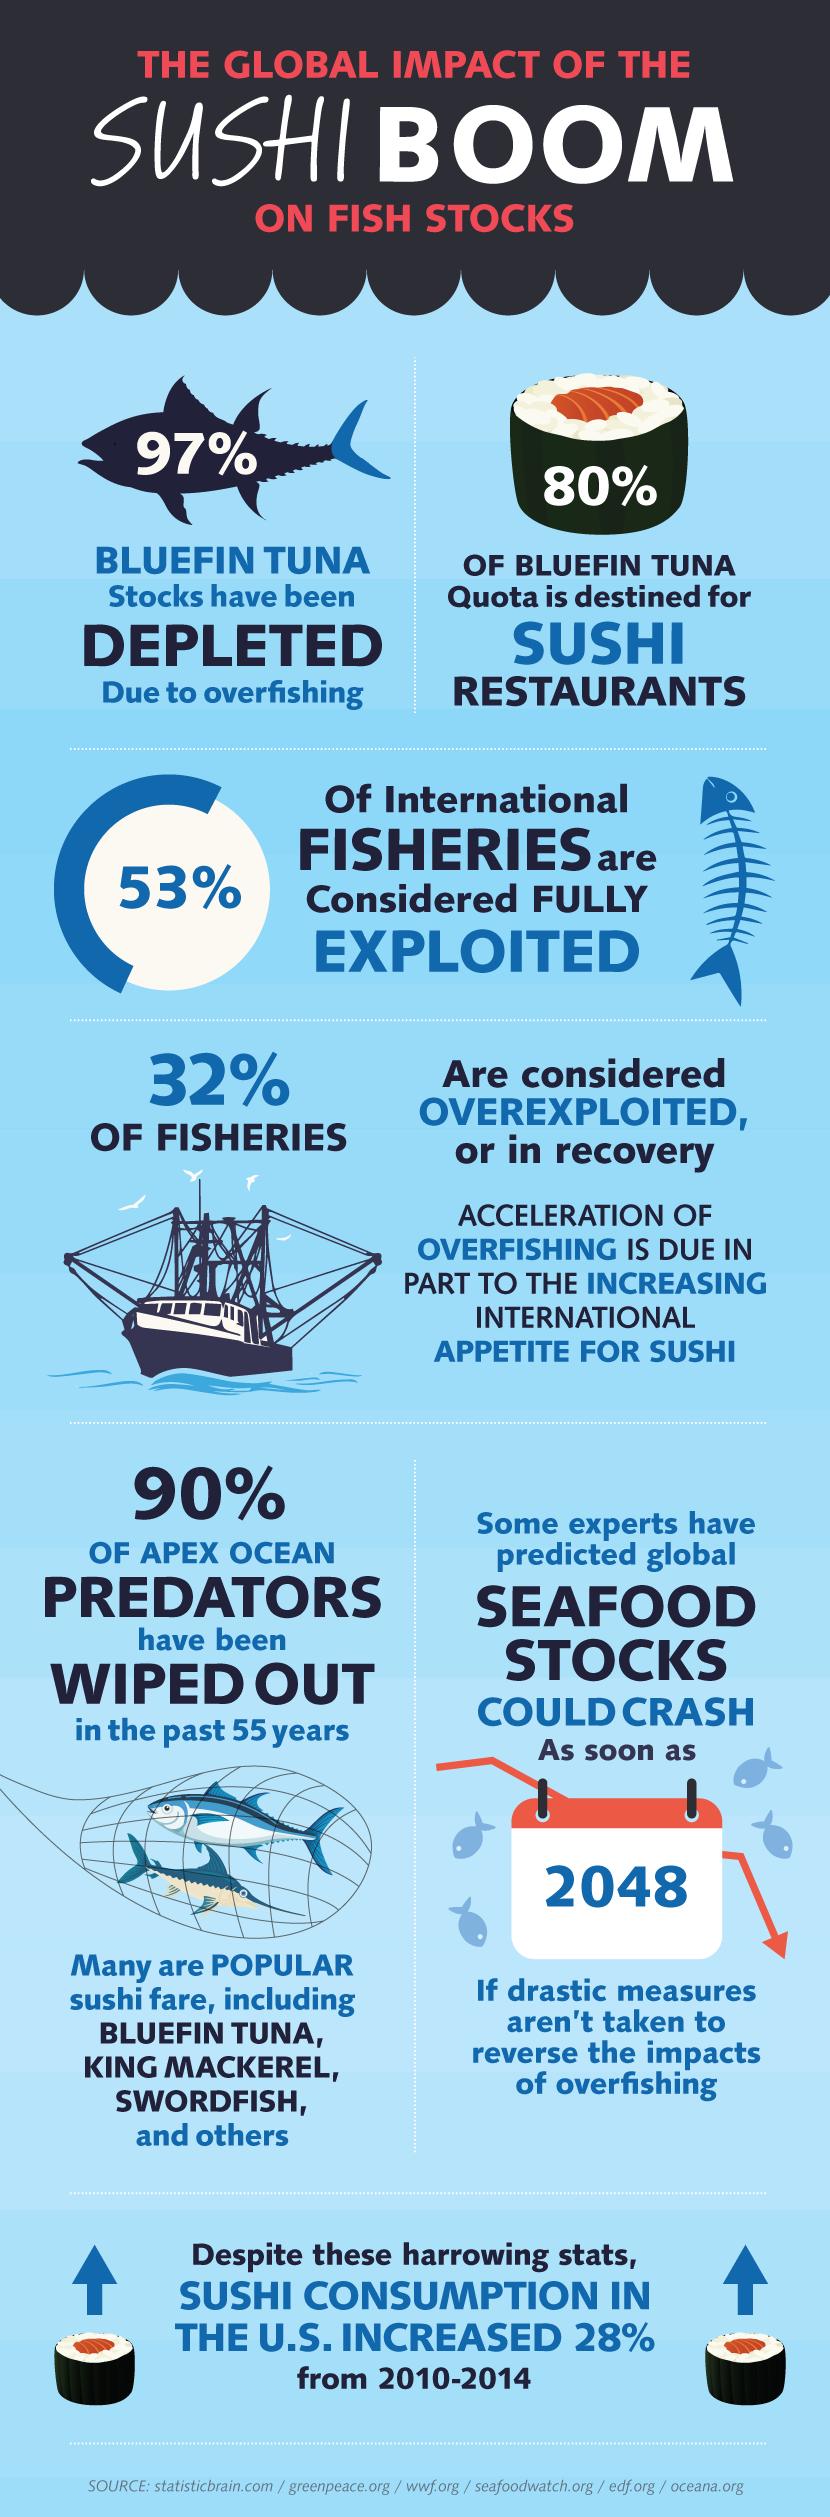 global-impact-of-sushi-boom-on-fish-stocks